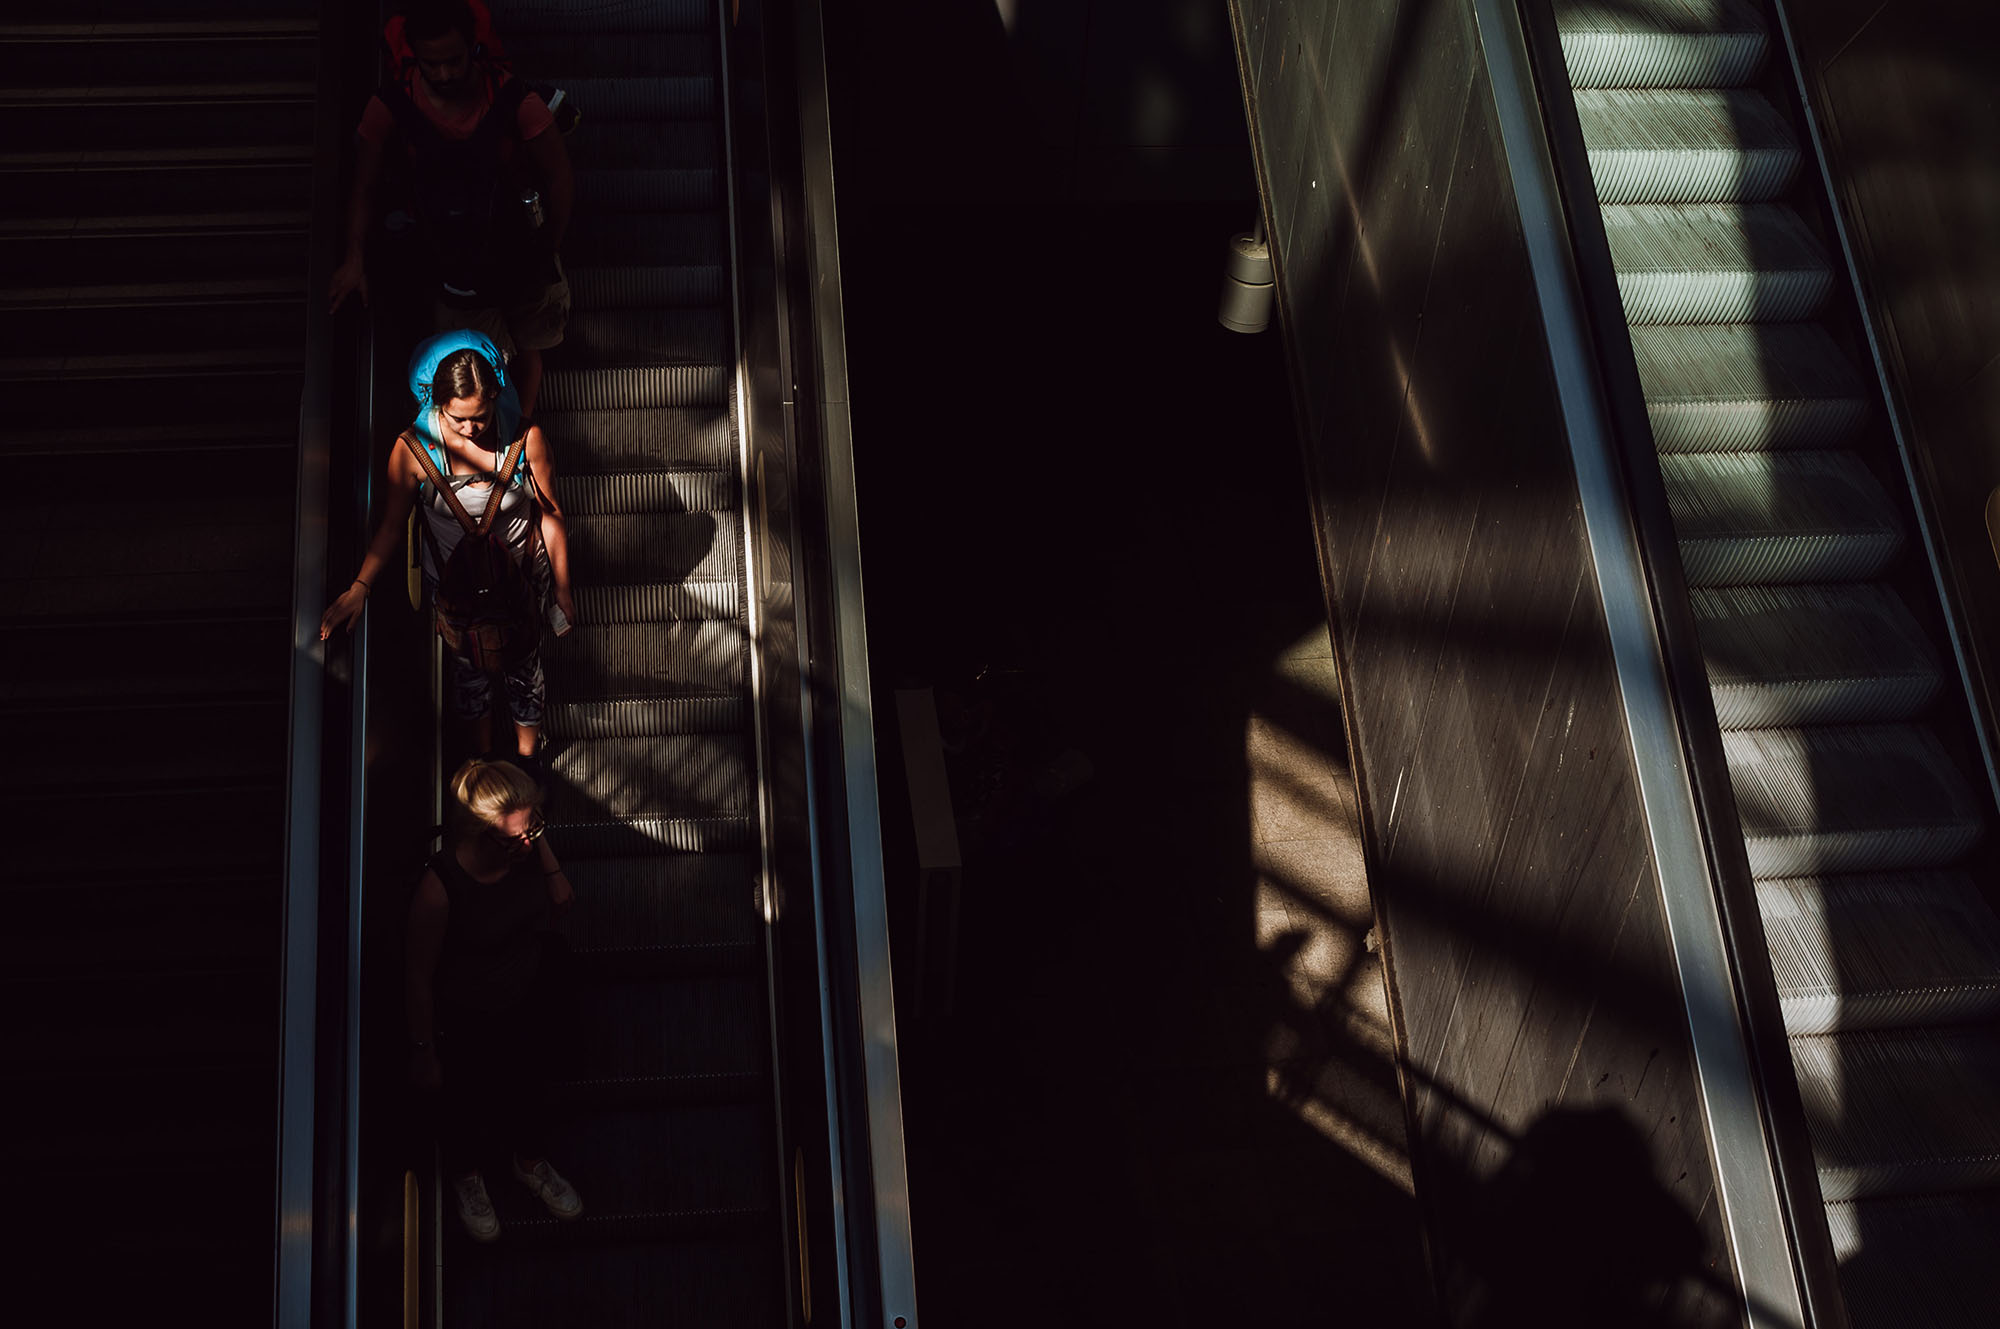 escalator berlin trains